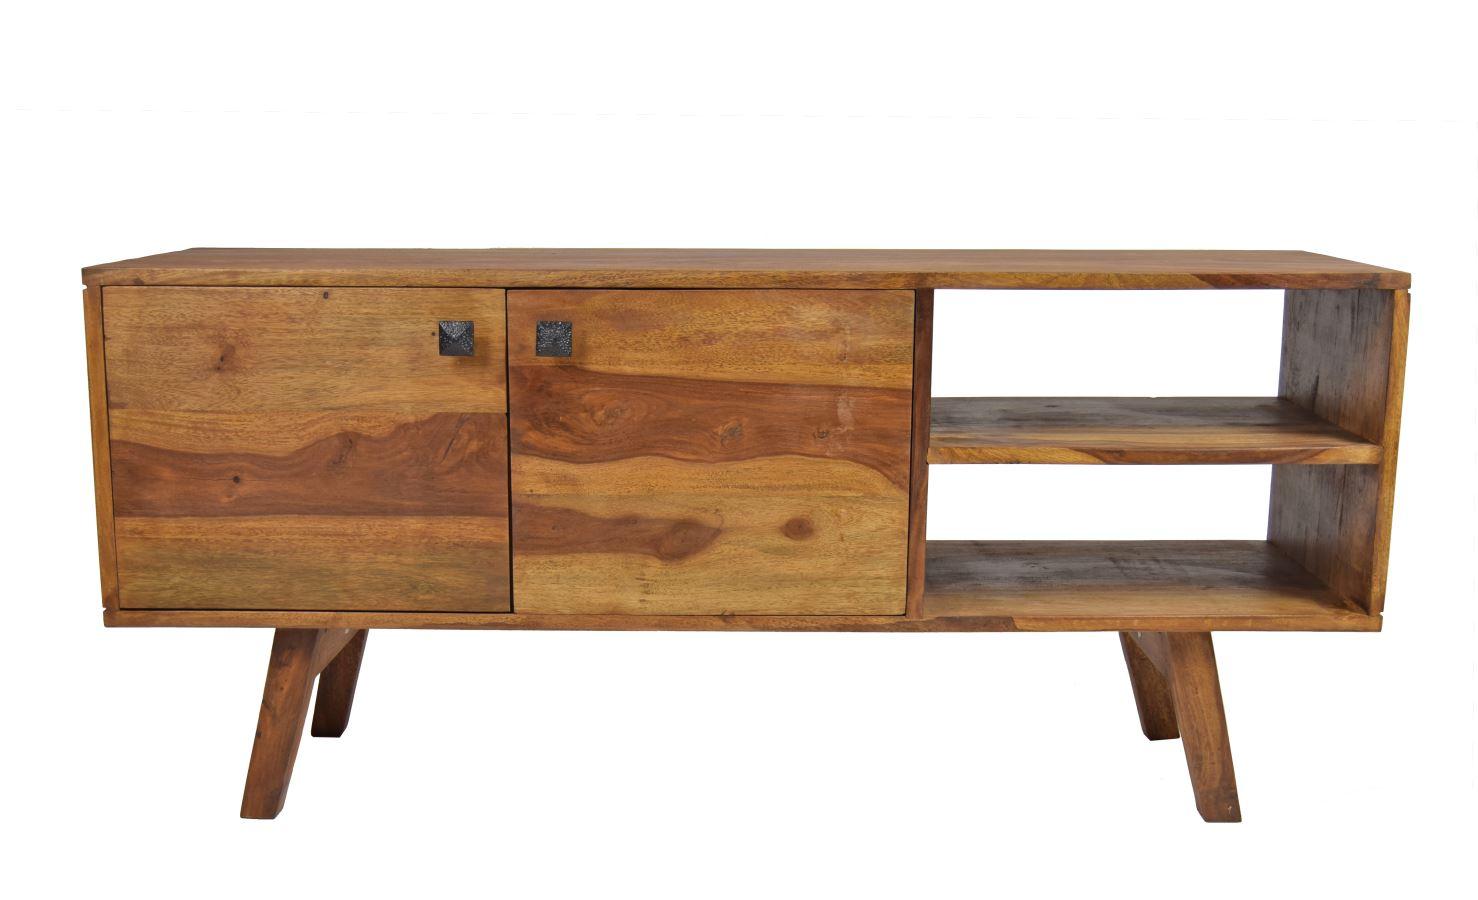 retro kommode authentic club memory massivholz m bel sideboards vintagehaus. Black Bedroom Furniture Sets. Home Design Ideas